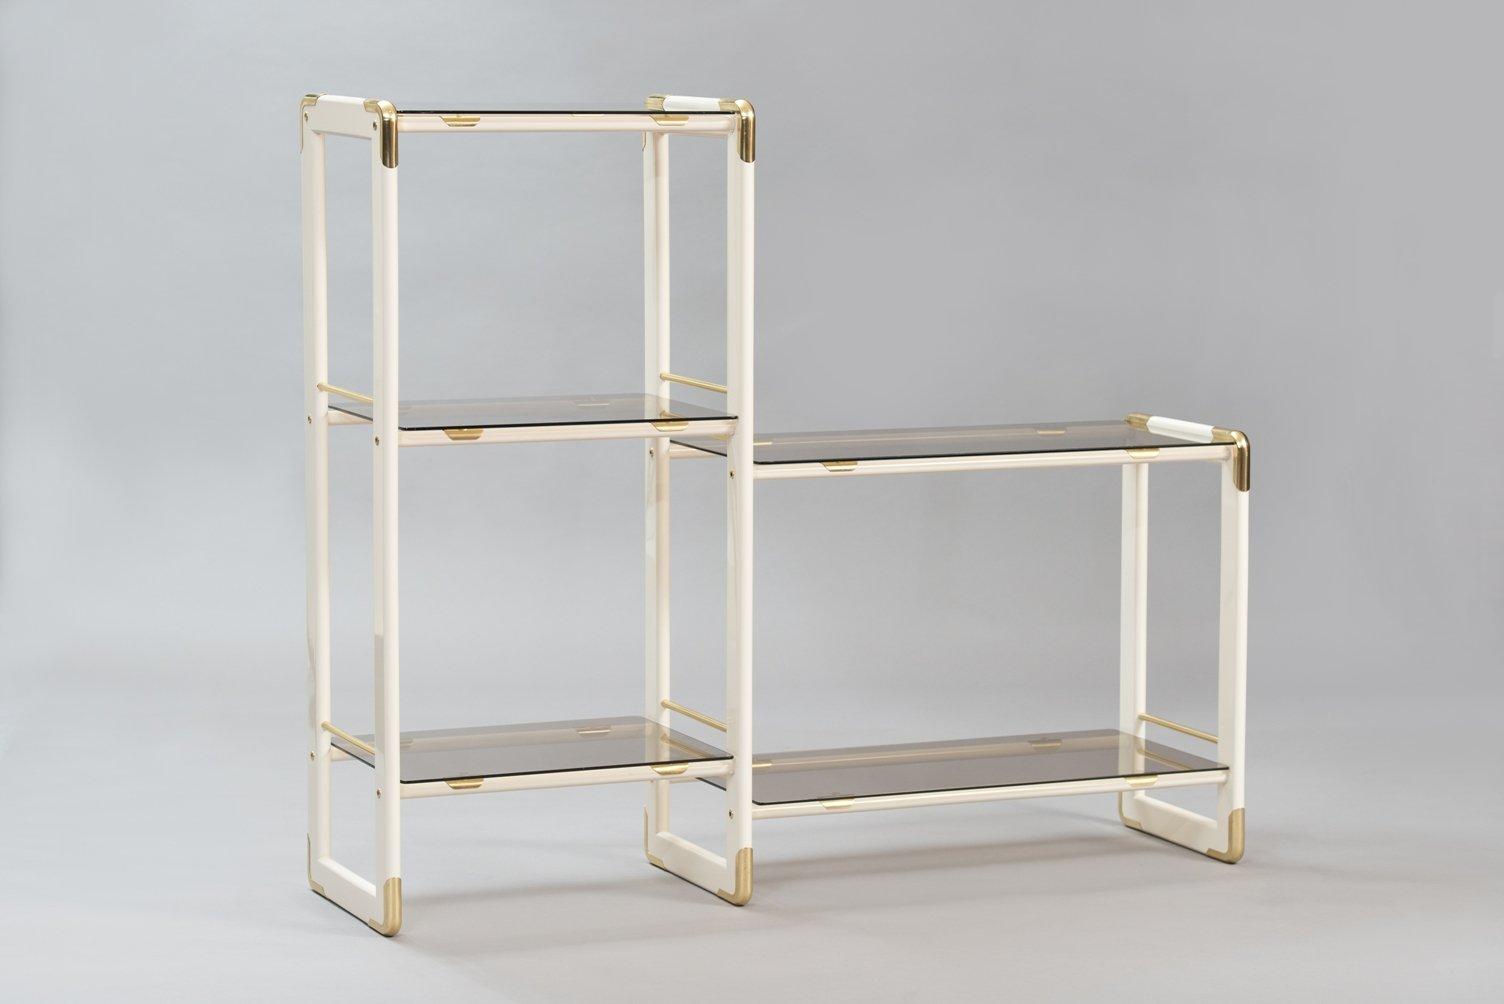 Vintage Italian Wood, Brass & Glass Bookshelf for sale at Pamono